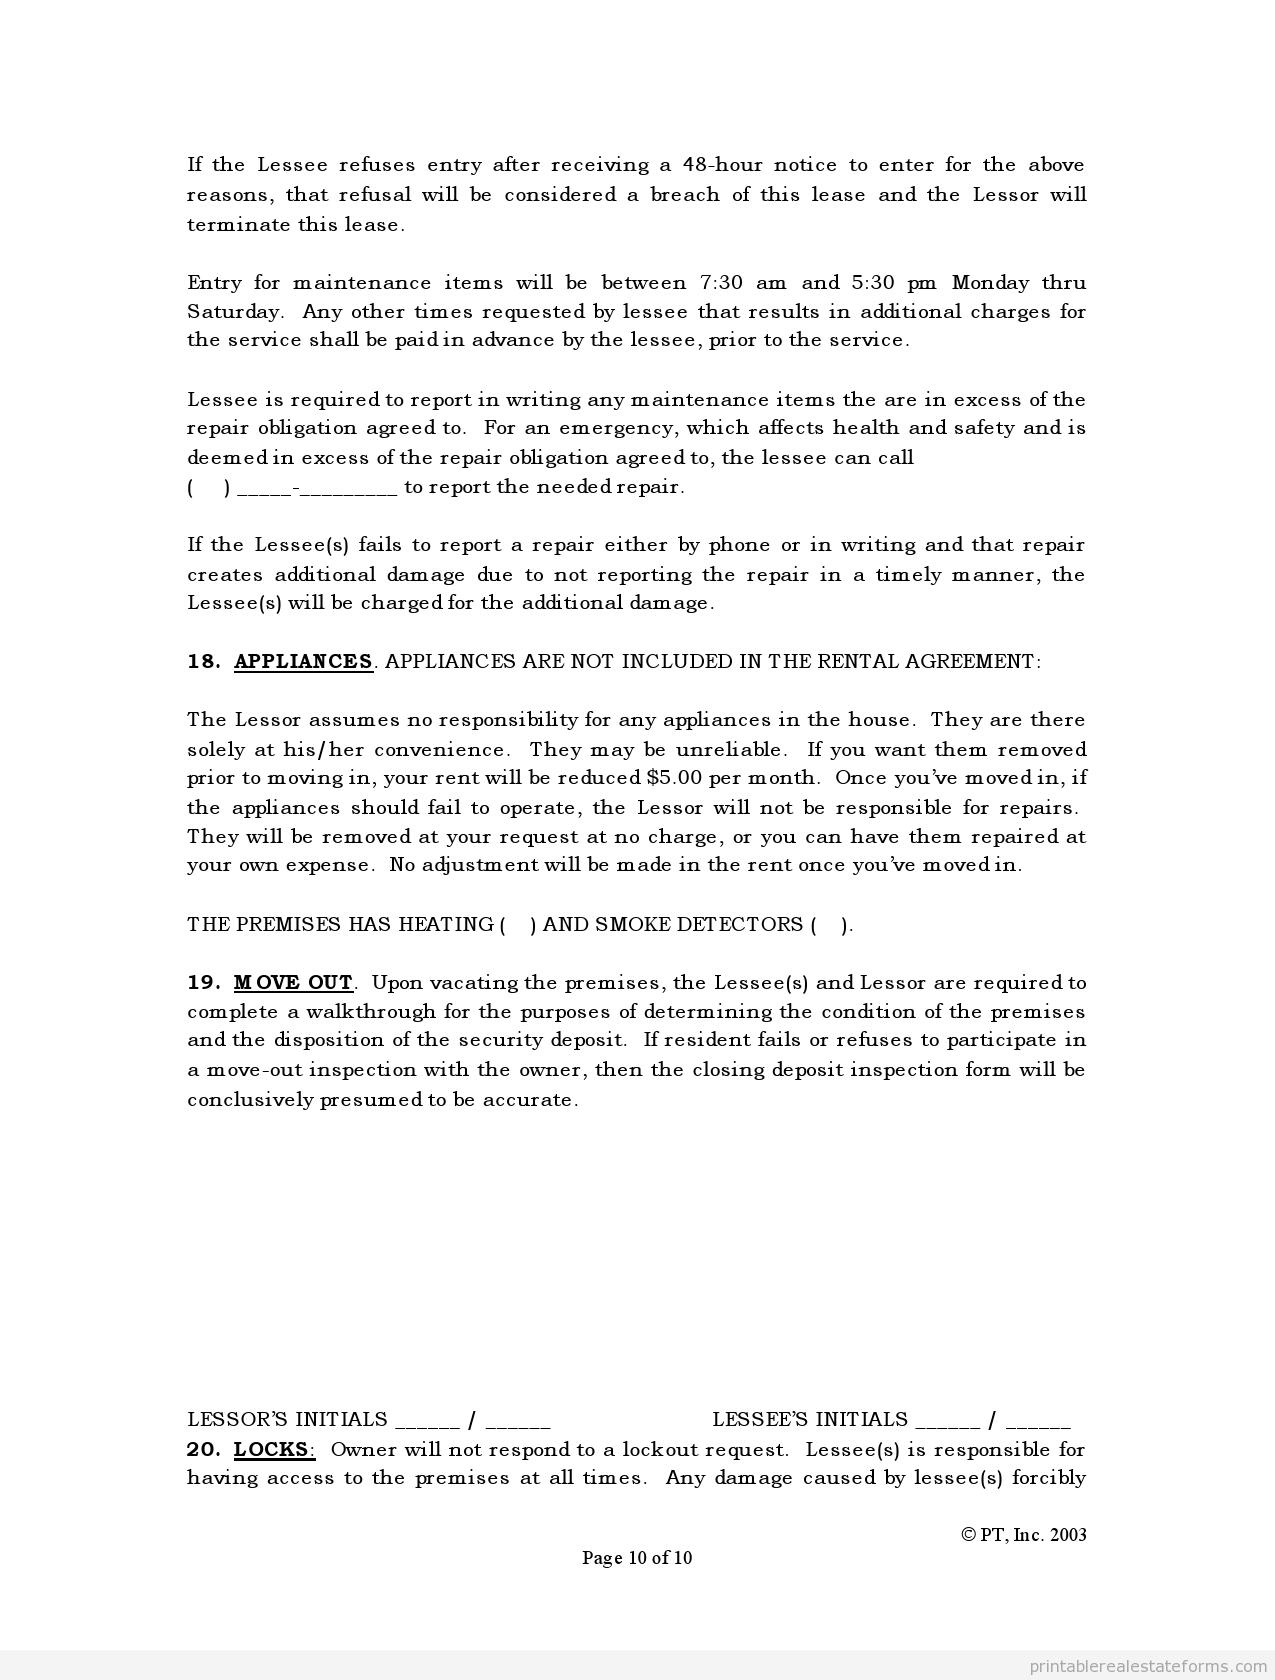 Sample Memorandum Of Lease Agreement Sample Agreement Form.